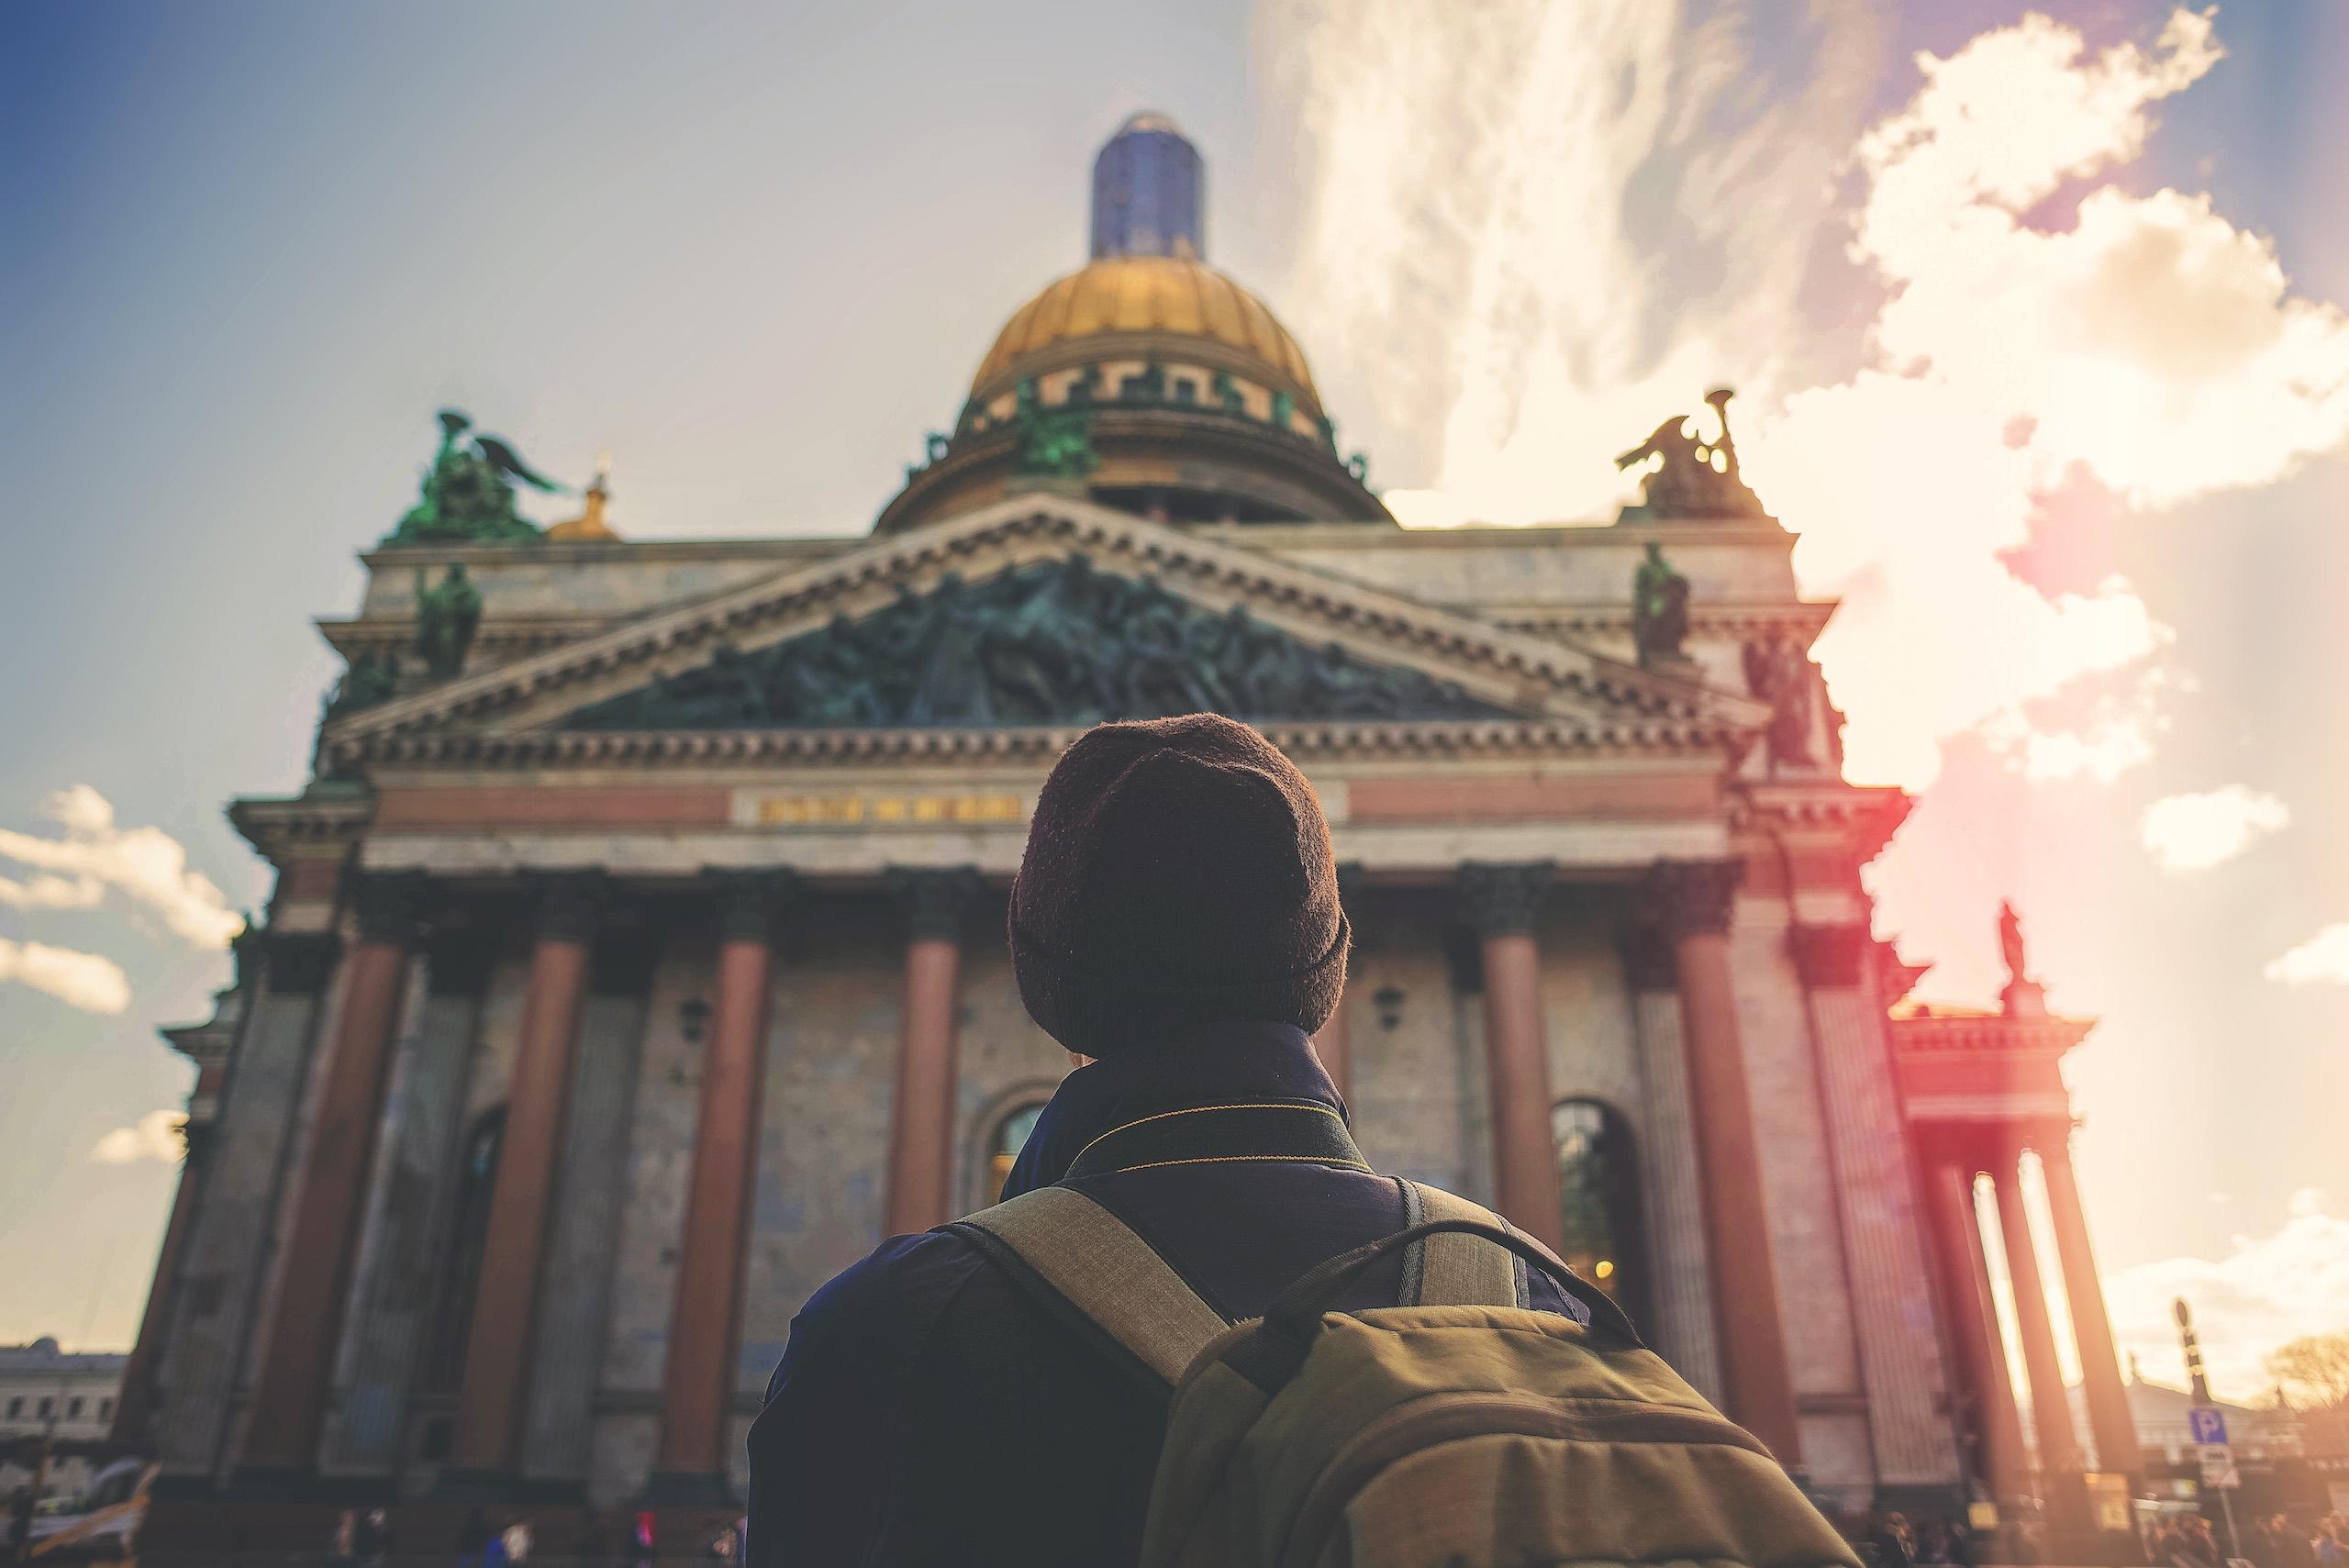 St. Isaacs Cathedral | Photo: Ilia Schelkanov